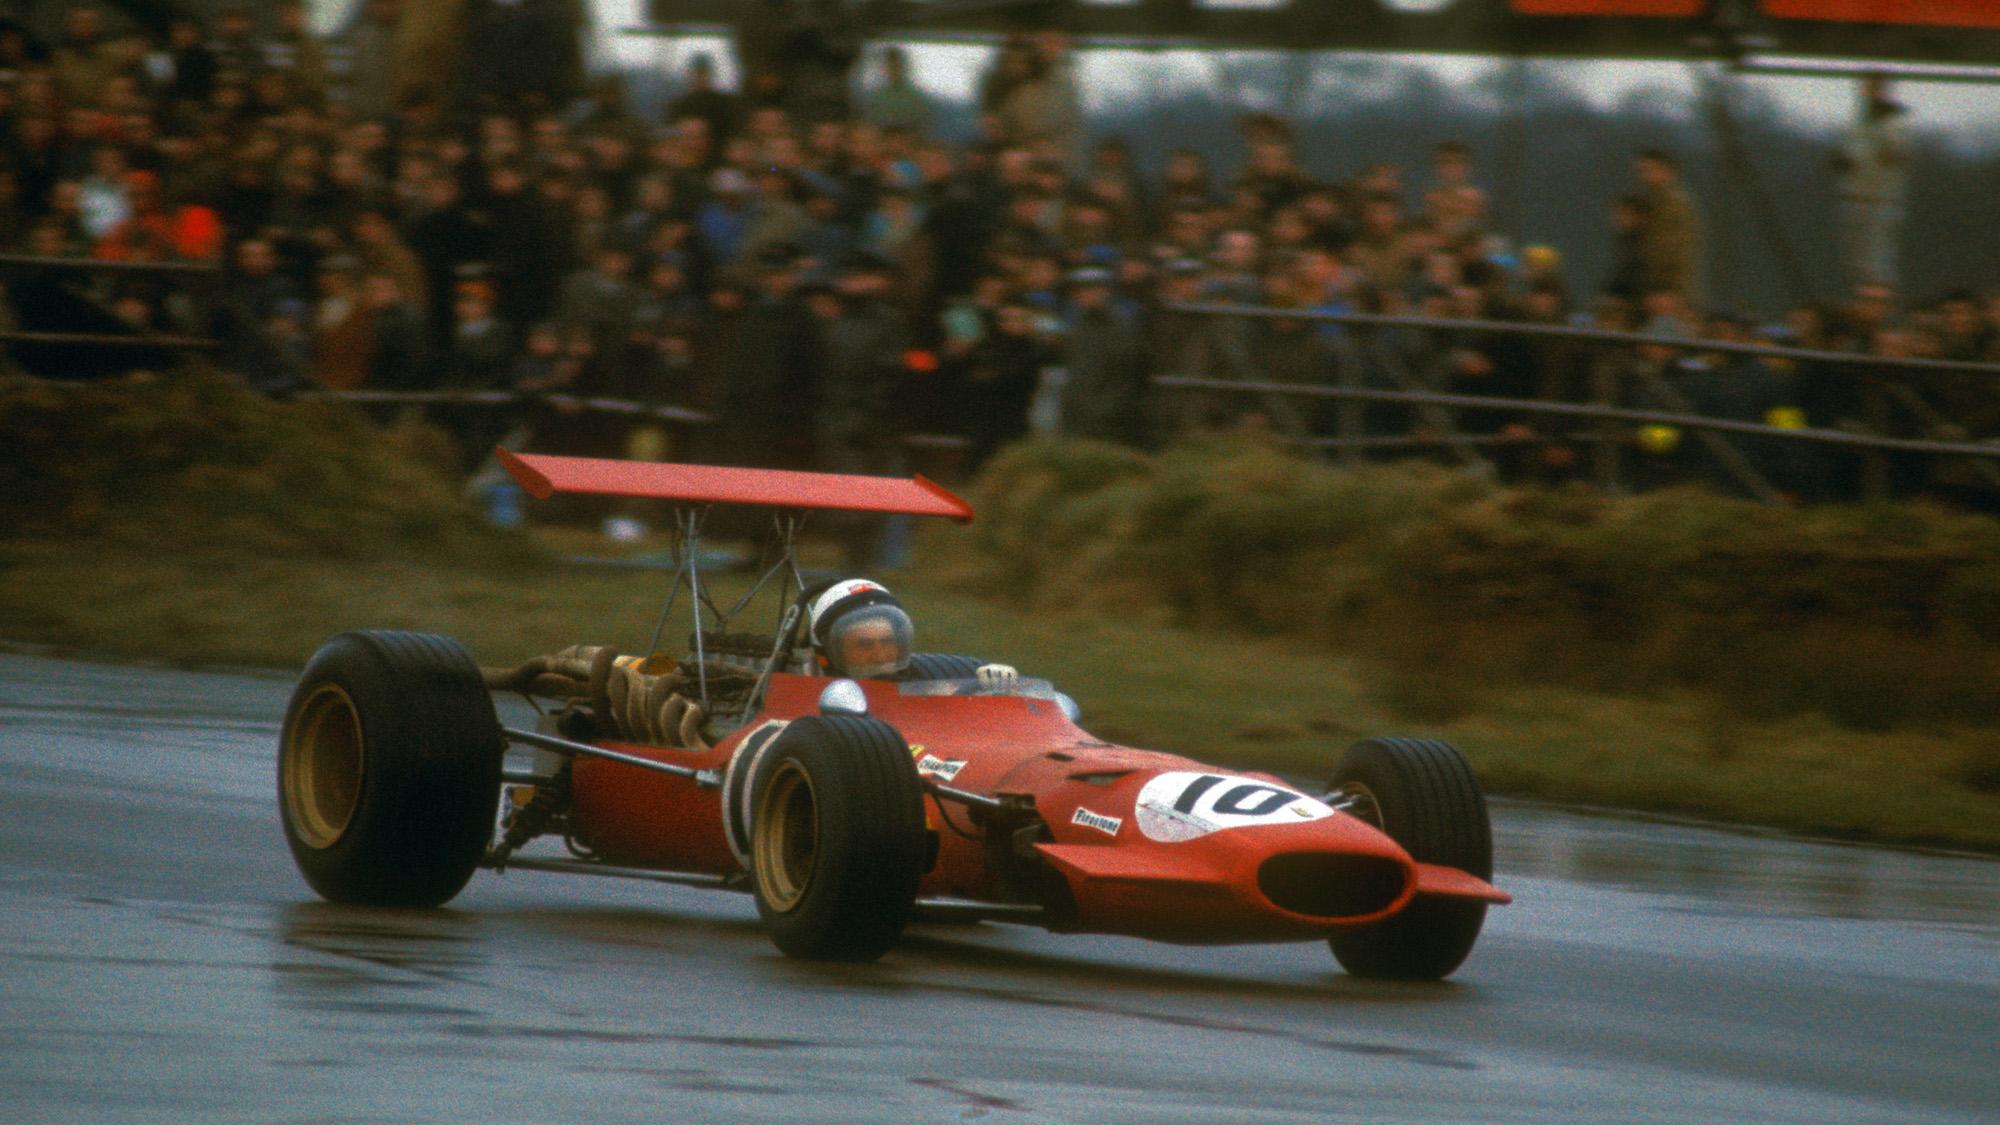 Derek Bell in a Ferrari 312 during the 1969 International Trophy at Silverstone